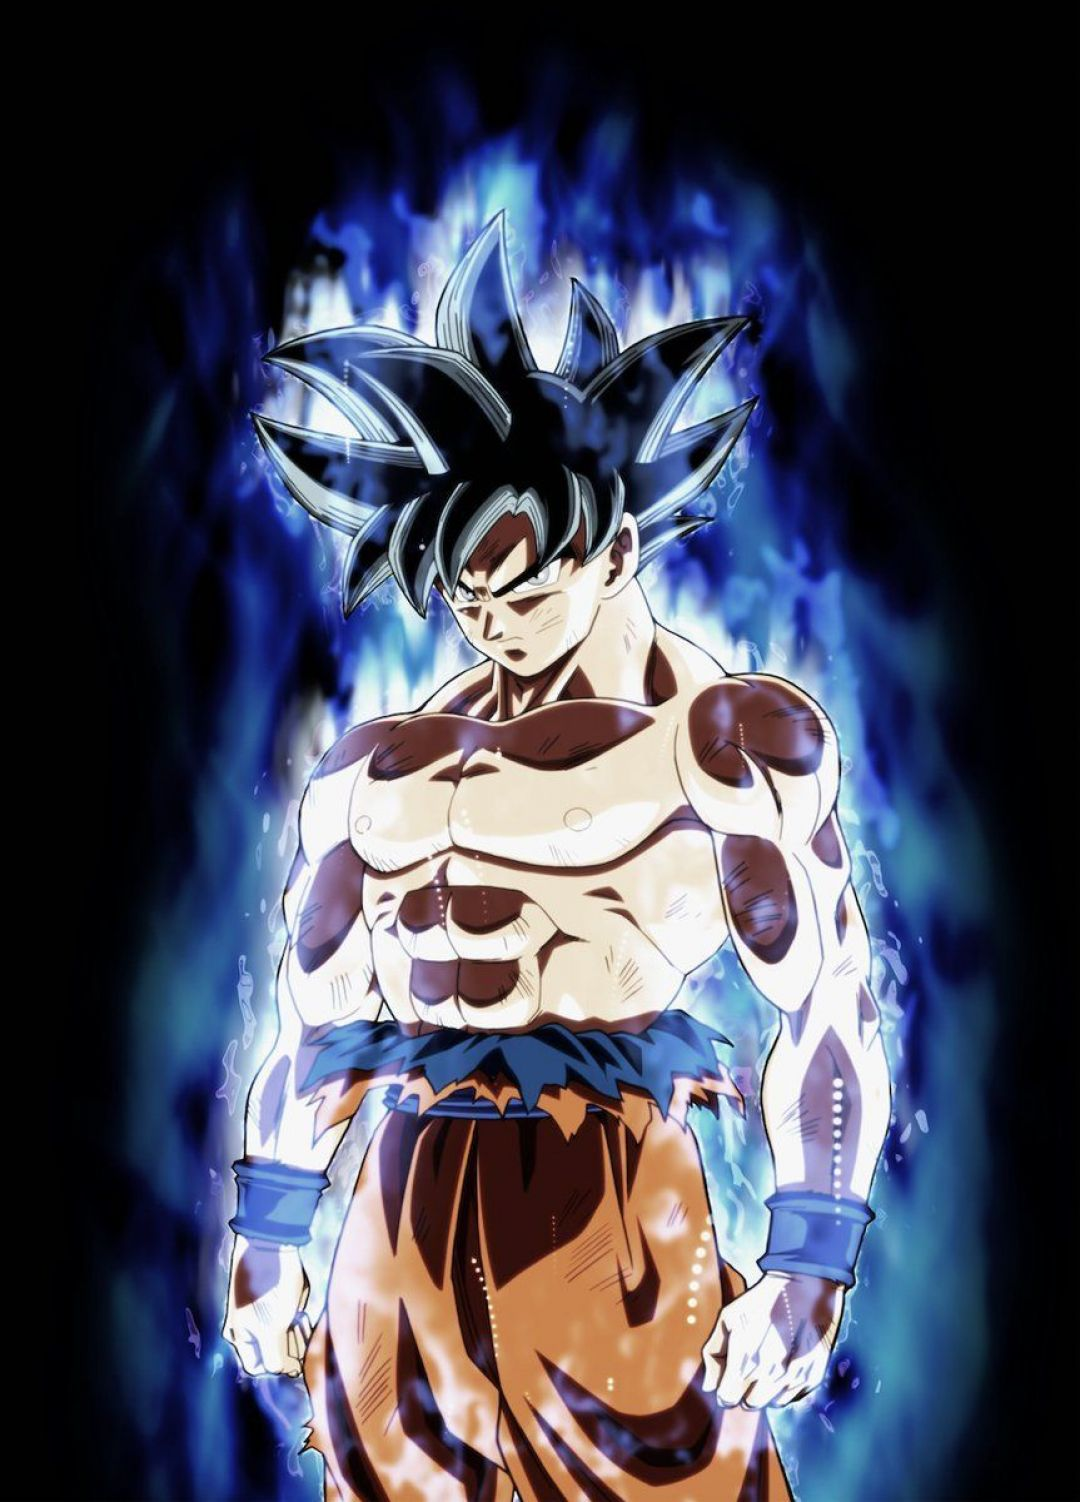 Ultra Instinct Goku Wallpaper Son Goku Ultra Instinct